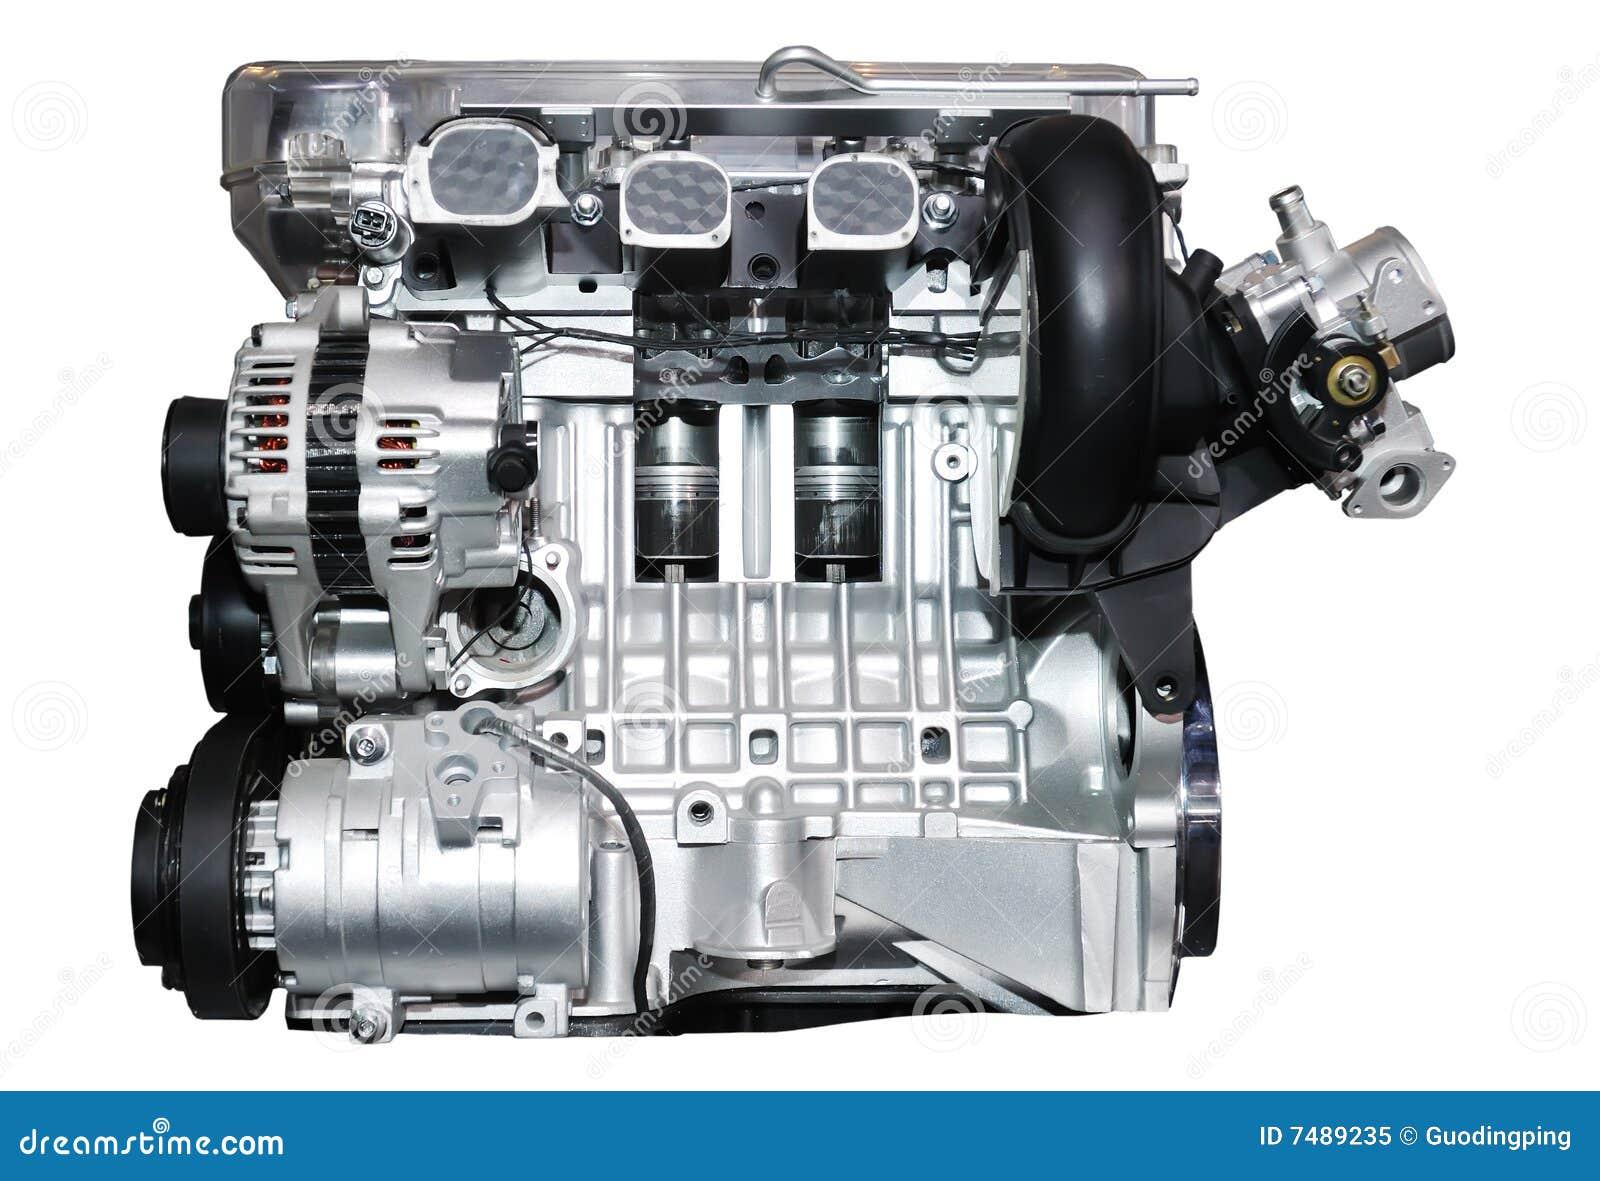 Automotor stockbild. Bild von eisen, metall, sauber, haube - 7489235